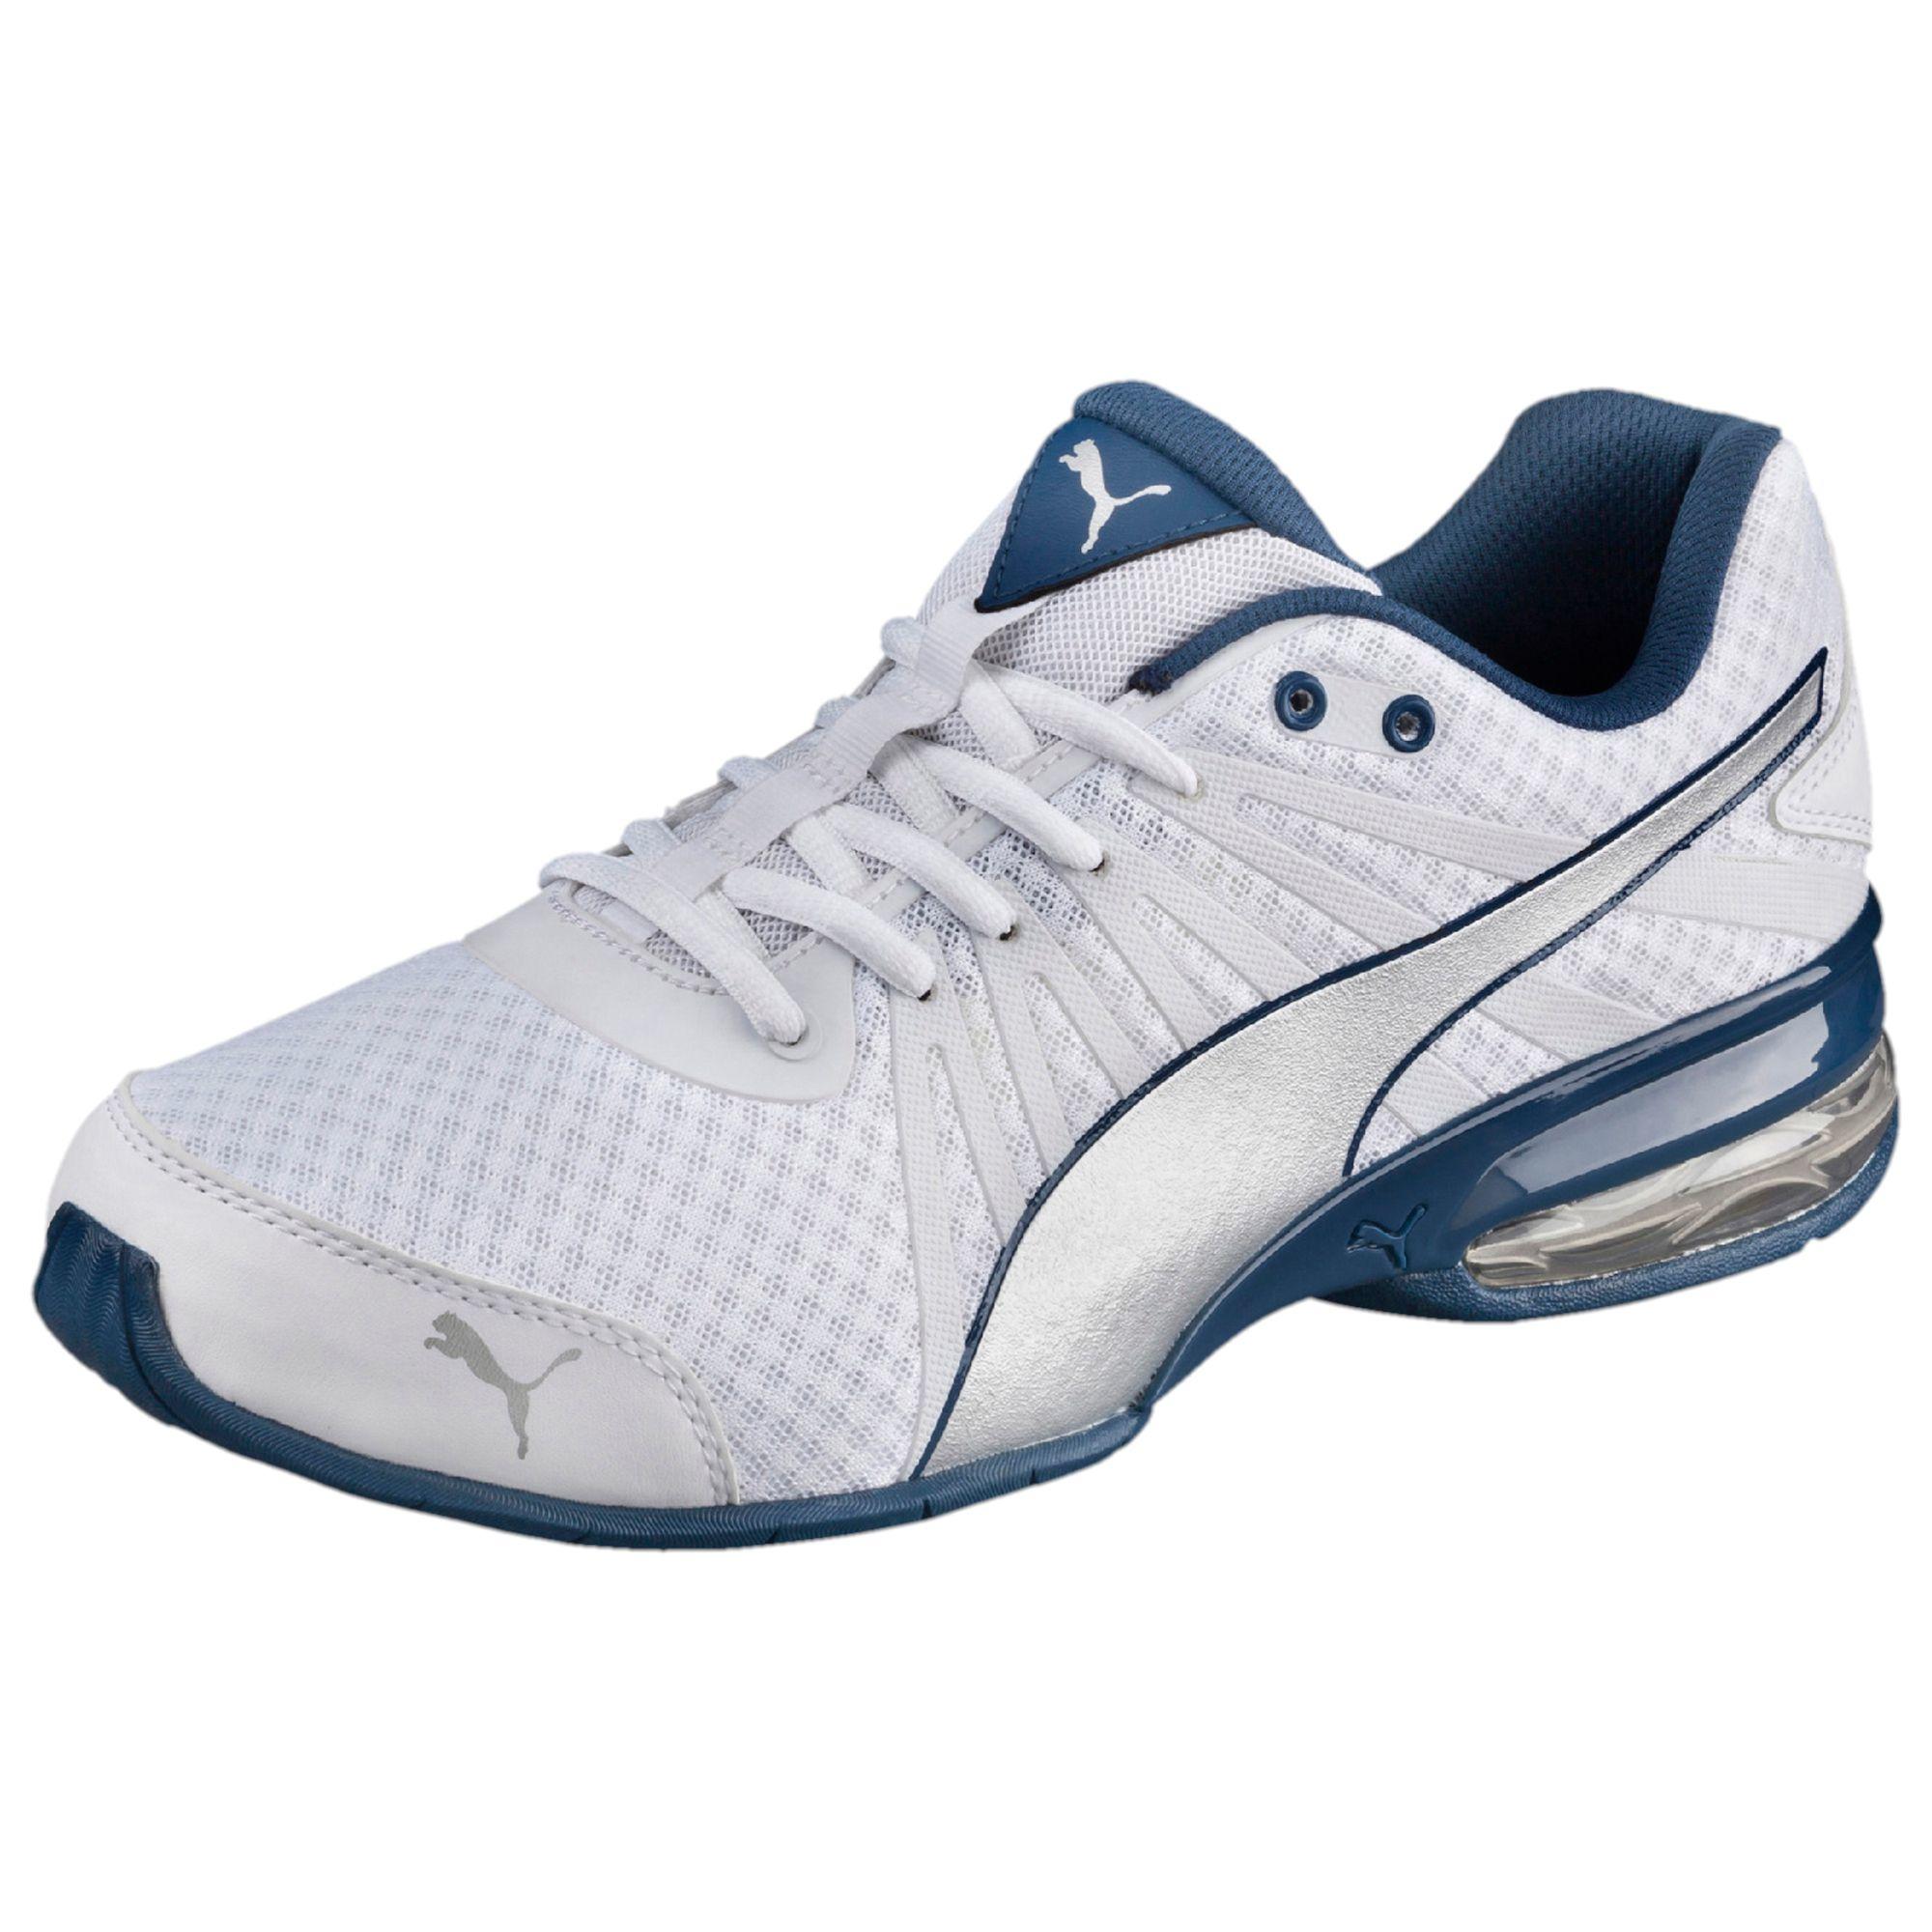 Lyst - PUMA Cell Kilter Men s Training Shoes in White for Men 9931571f0